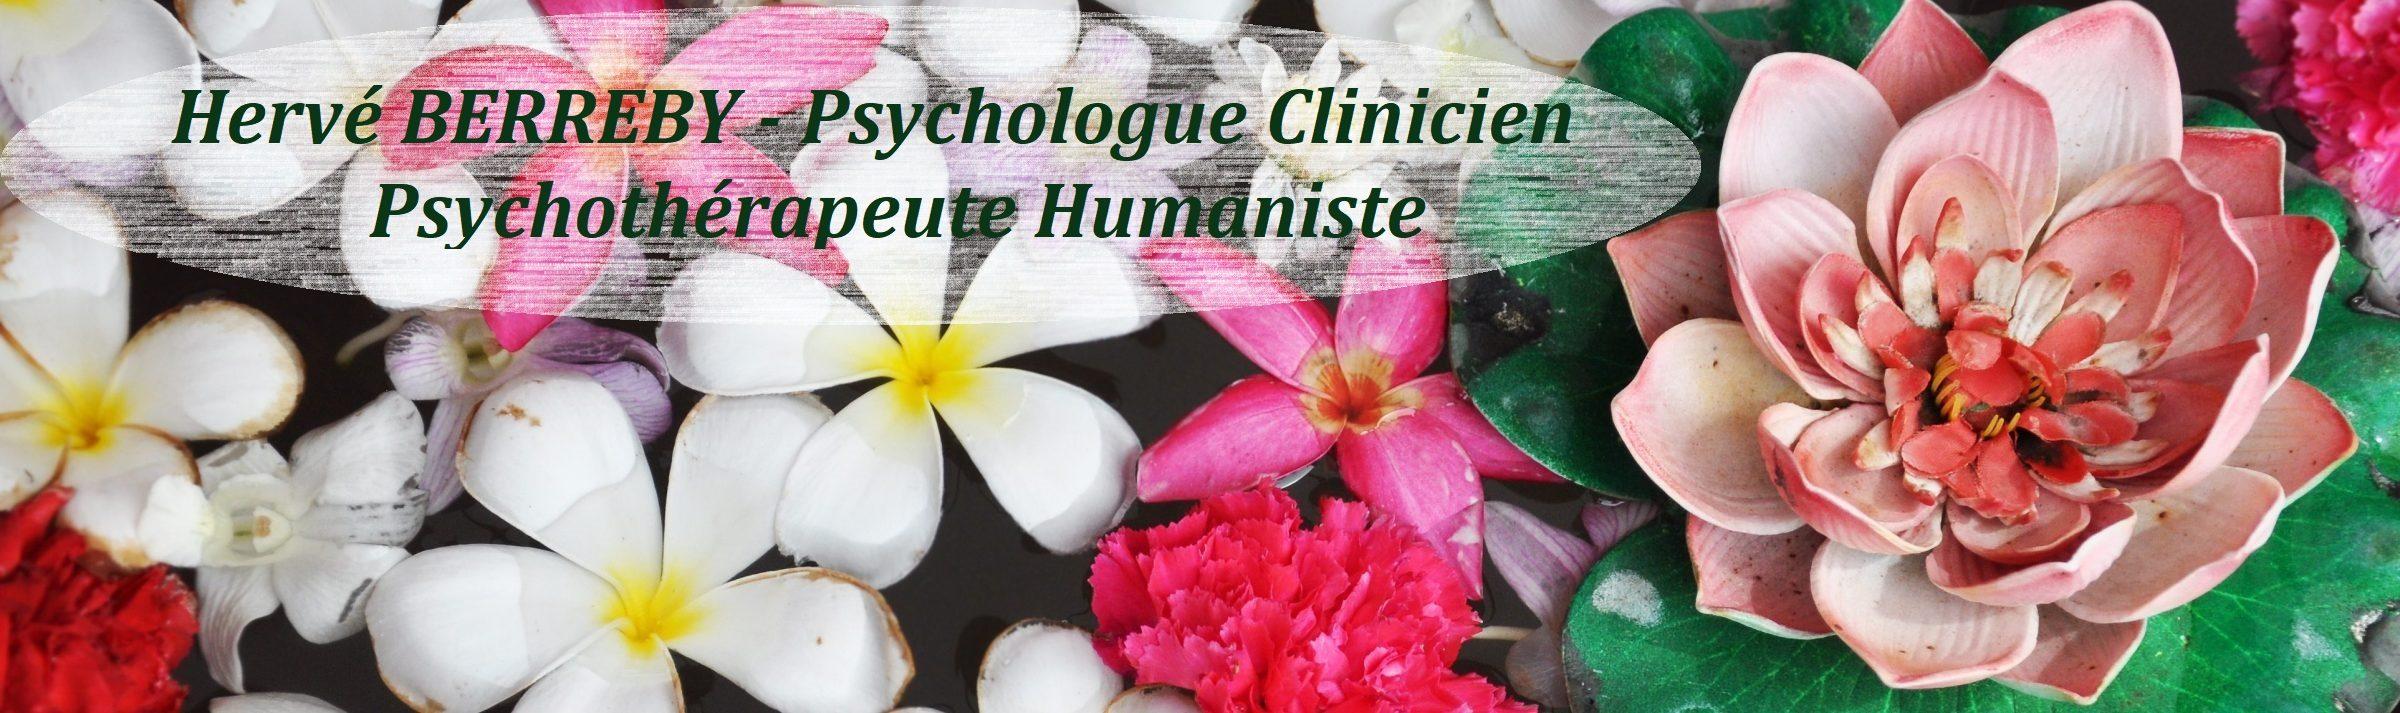 Hervé BERREBY – Psychologue clinicien à Aix-En-Provence – 0609031585